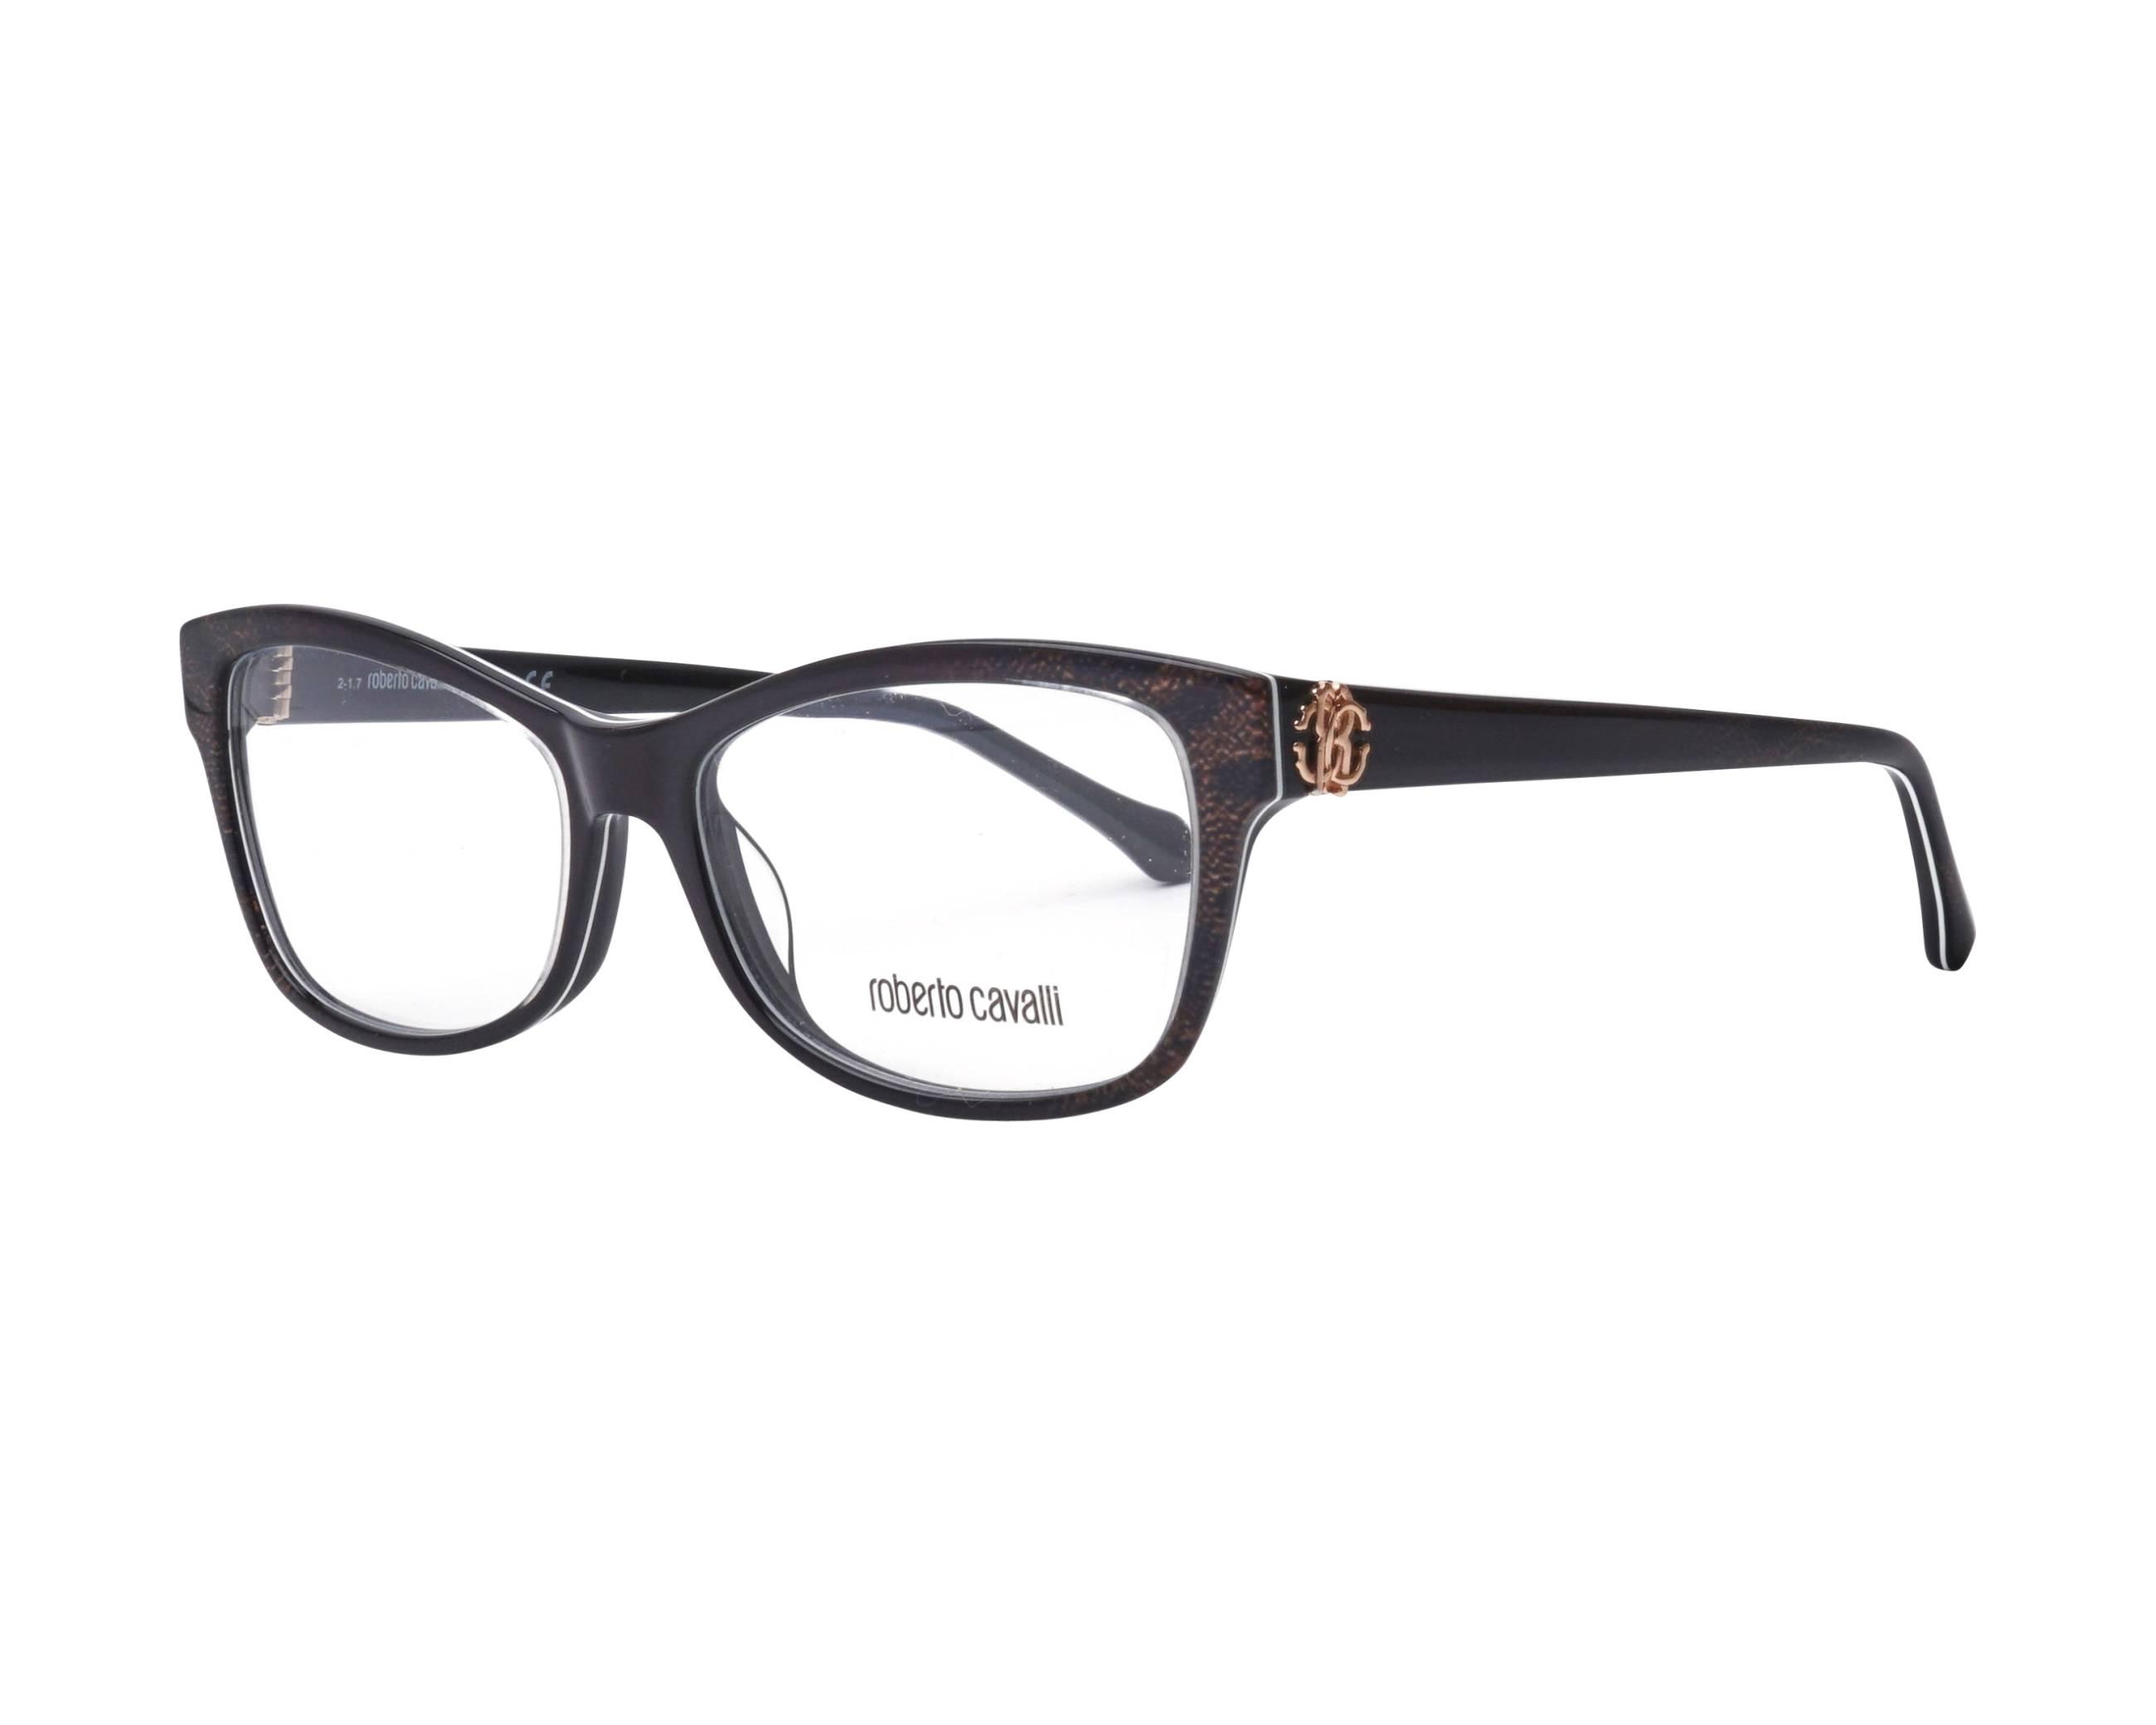 3c1e650ecb eyeglasses Roberto Cavalli RC-5013 005 54-15 Brown Black profile view